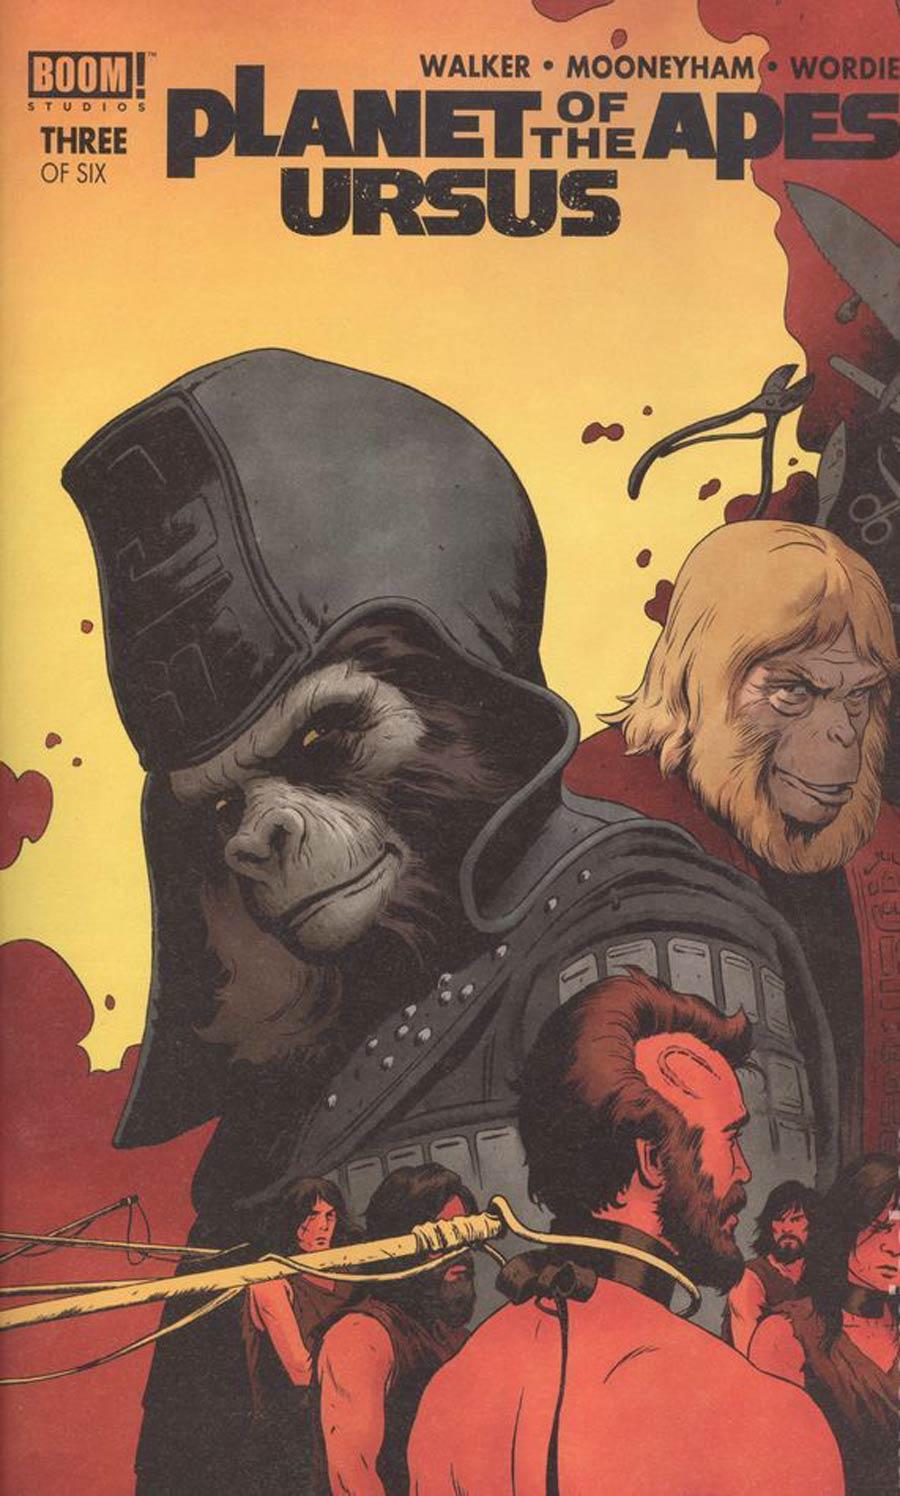 Planet Of The Apes Ursus #3 Cover A Regular Paolo Rivera & Joe Rivera Cover